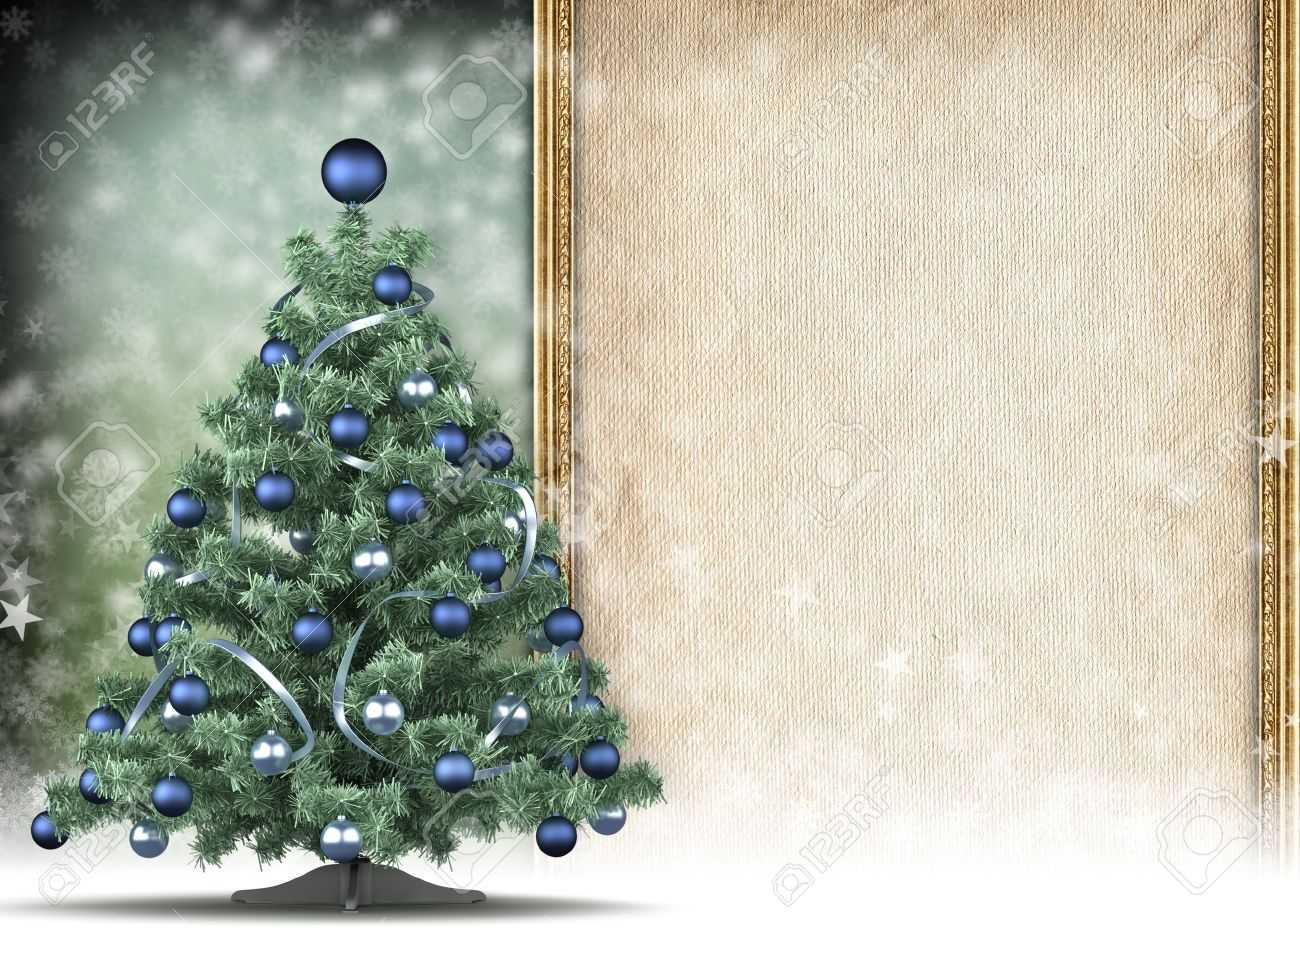 Christmas Card Template - Xmas Tree And Blank Space For Text With Blank Christmas Card Templates Free